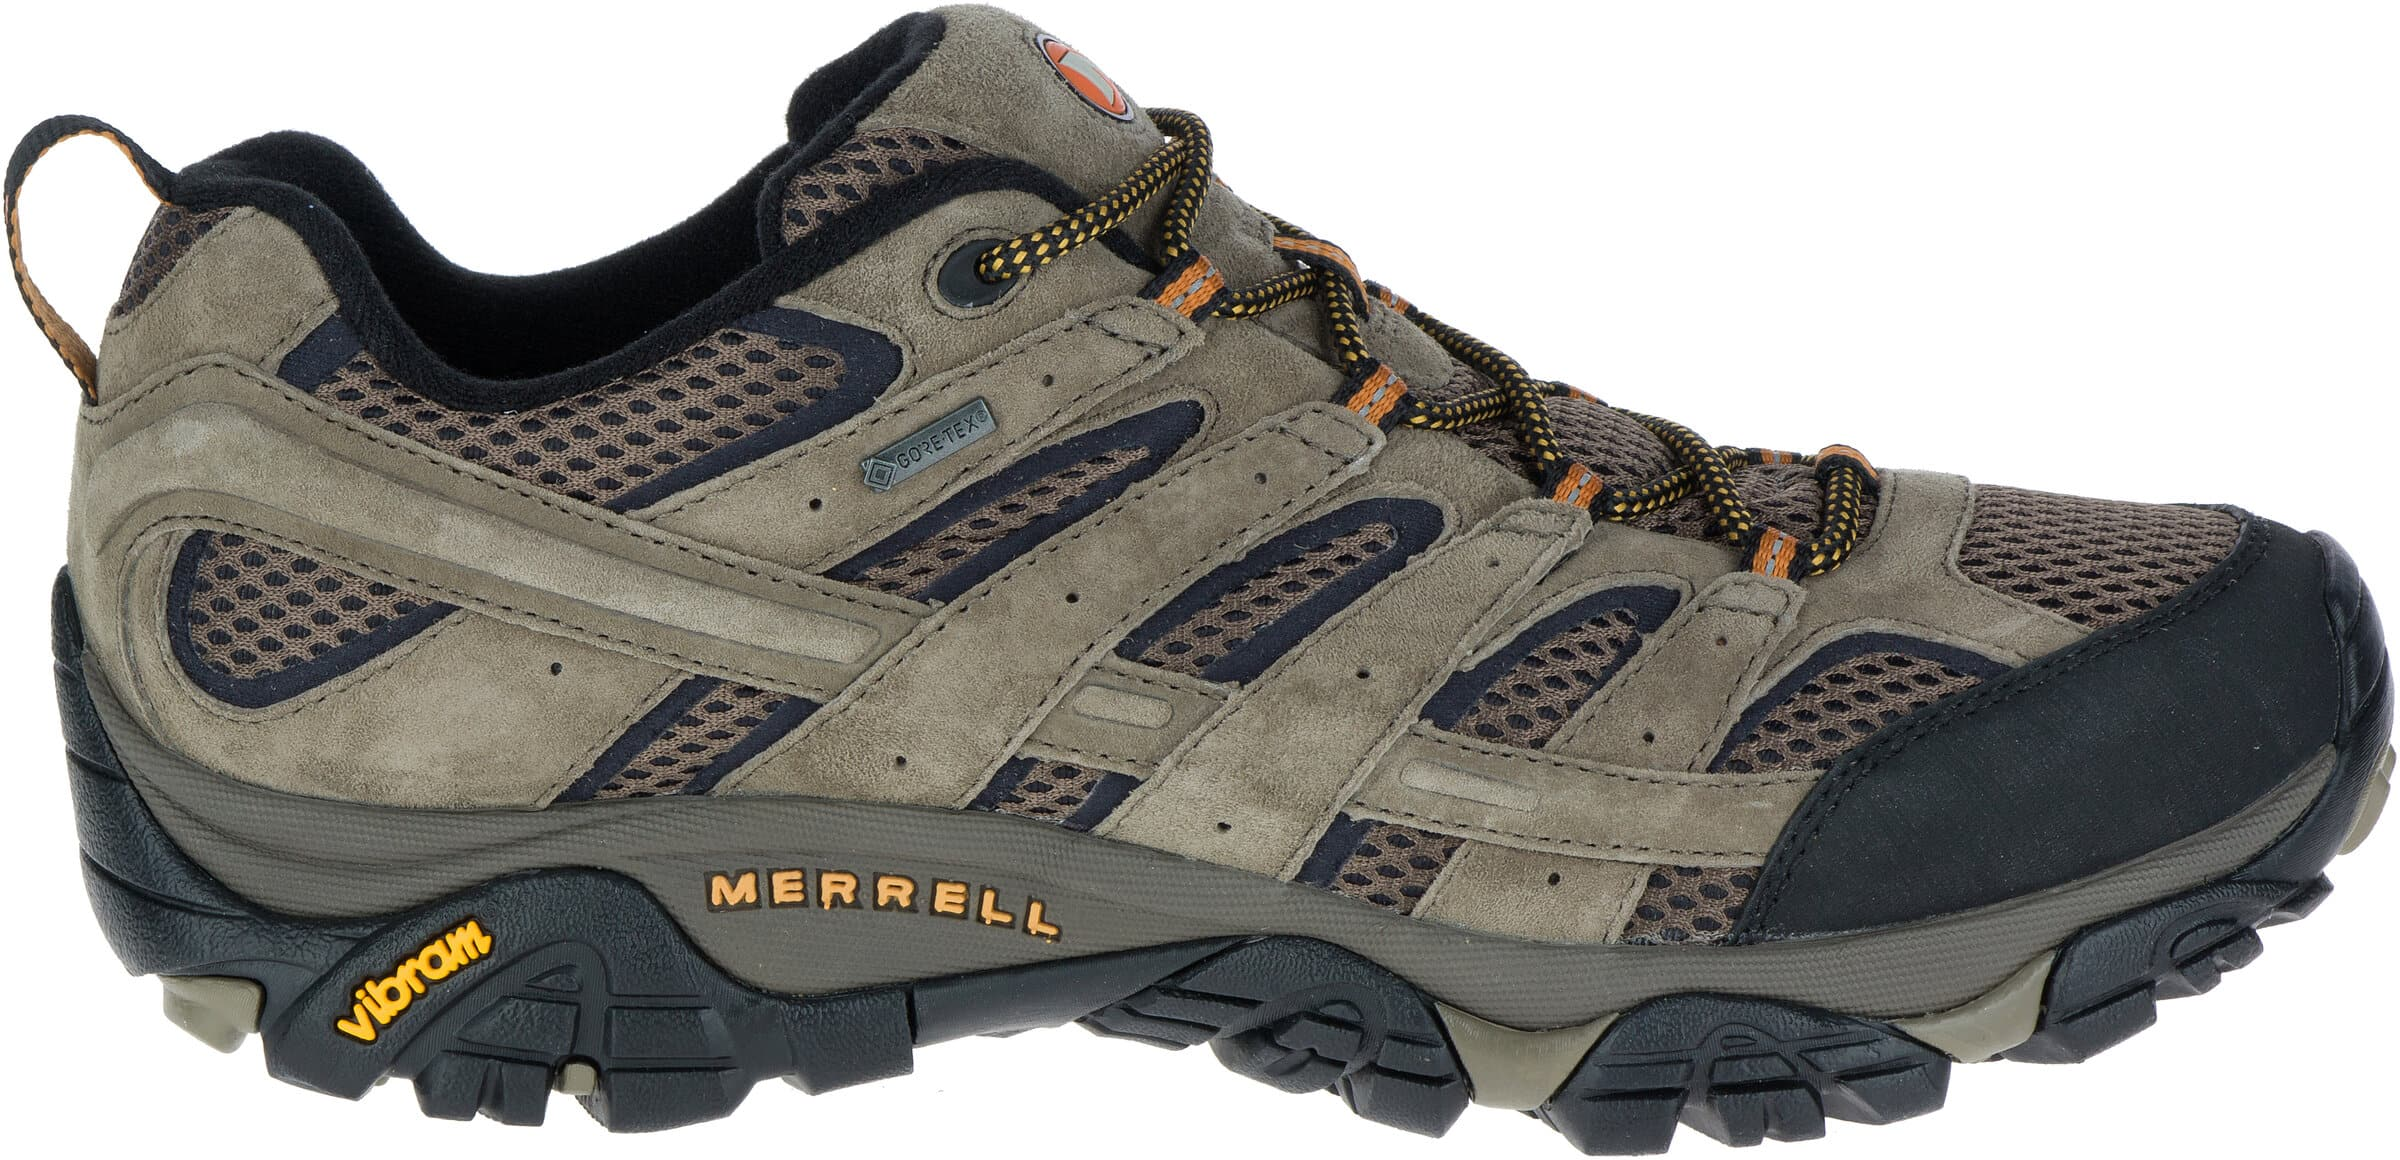 Merrell Moab II Ltr GTX Herren-Multifunktionsschuh